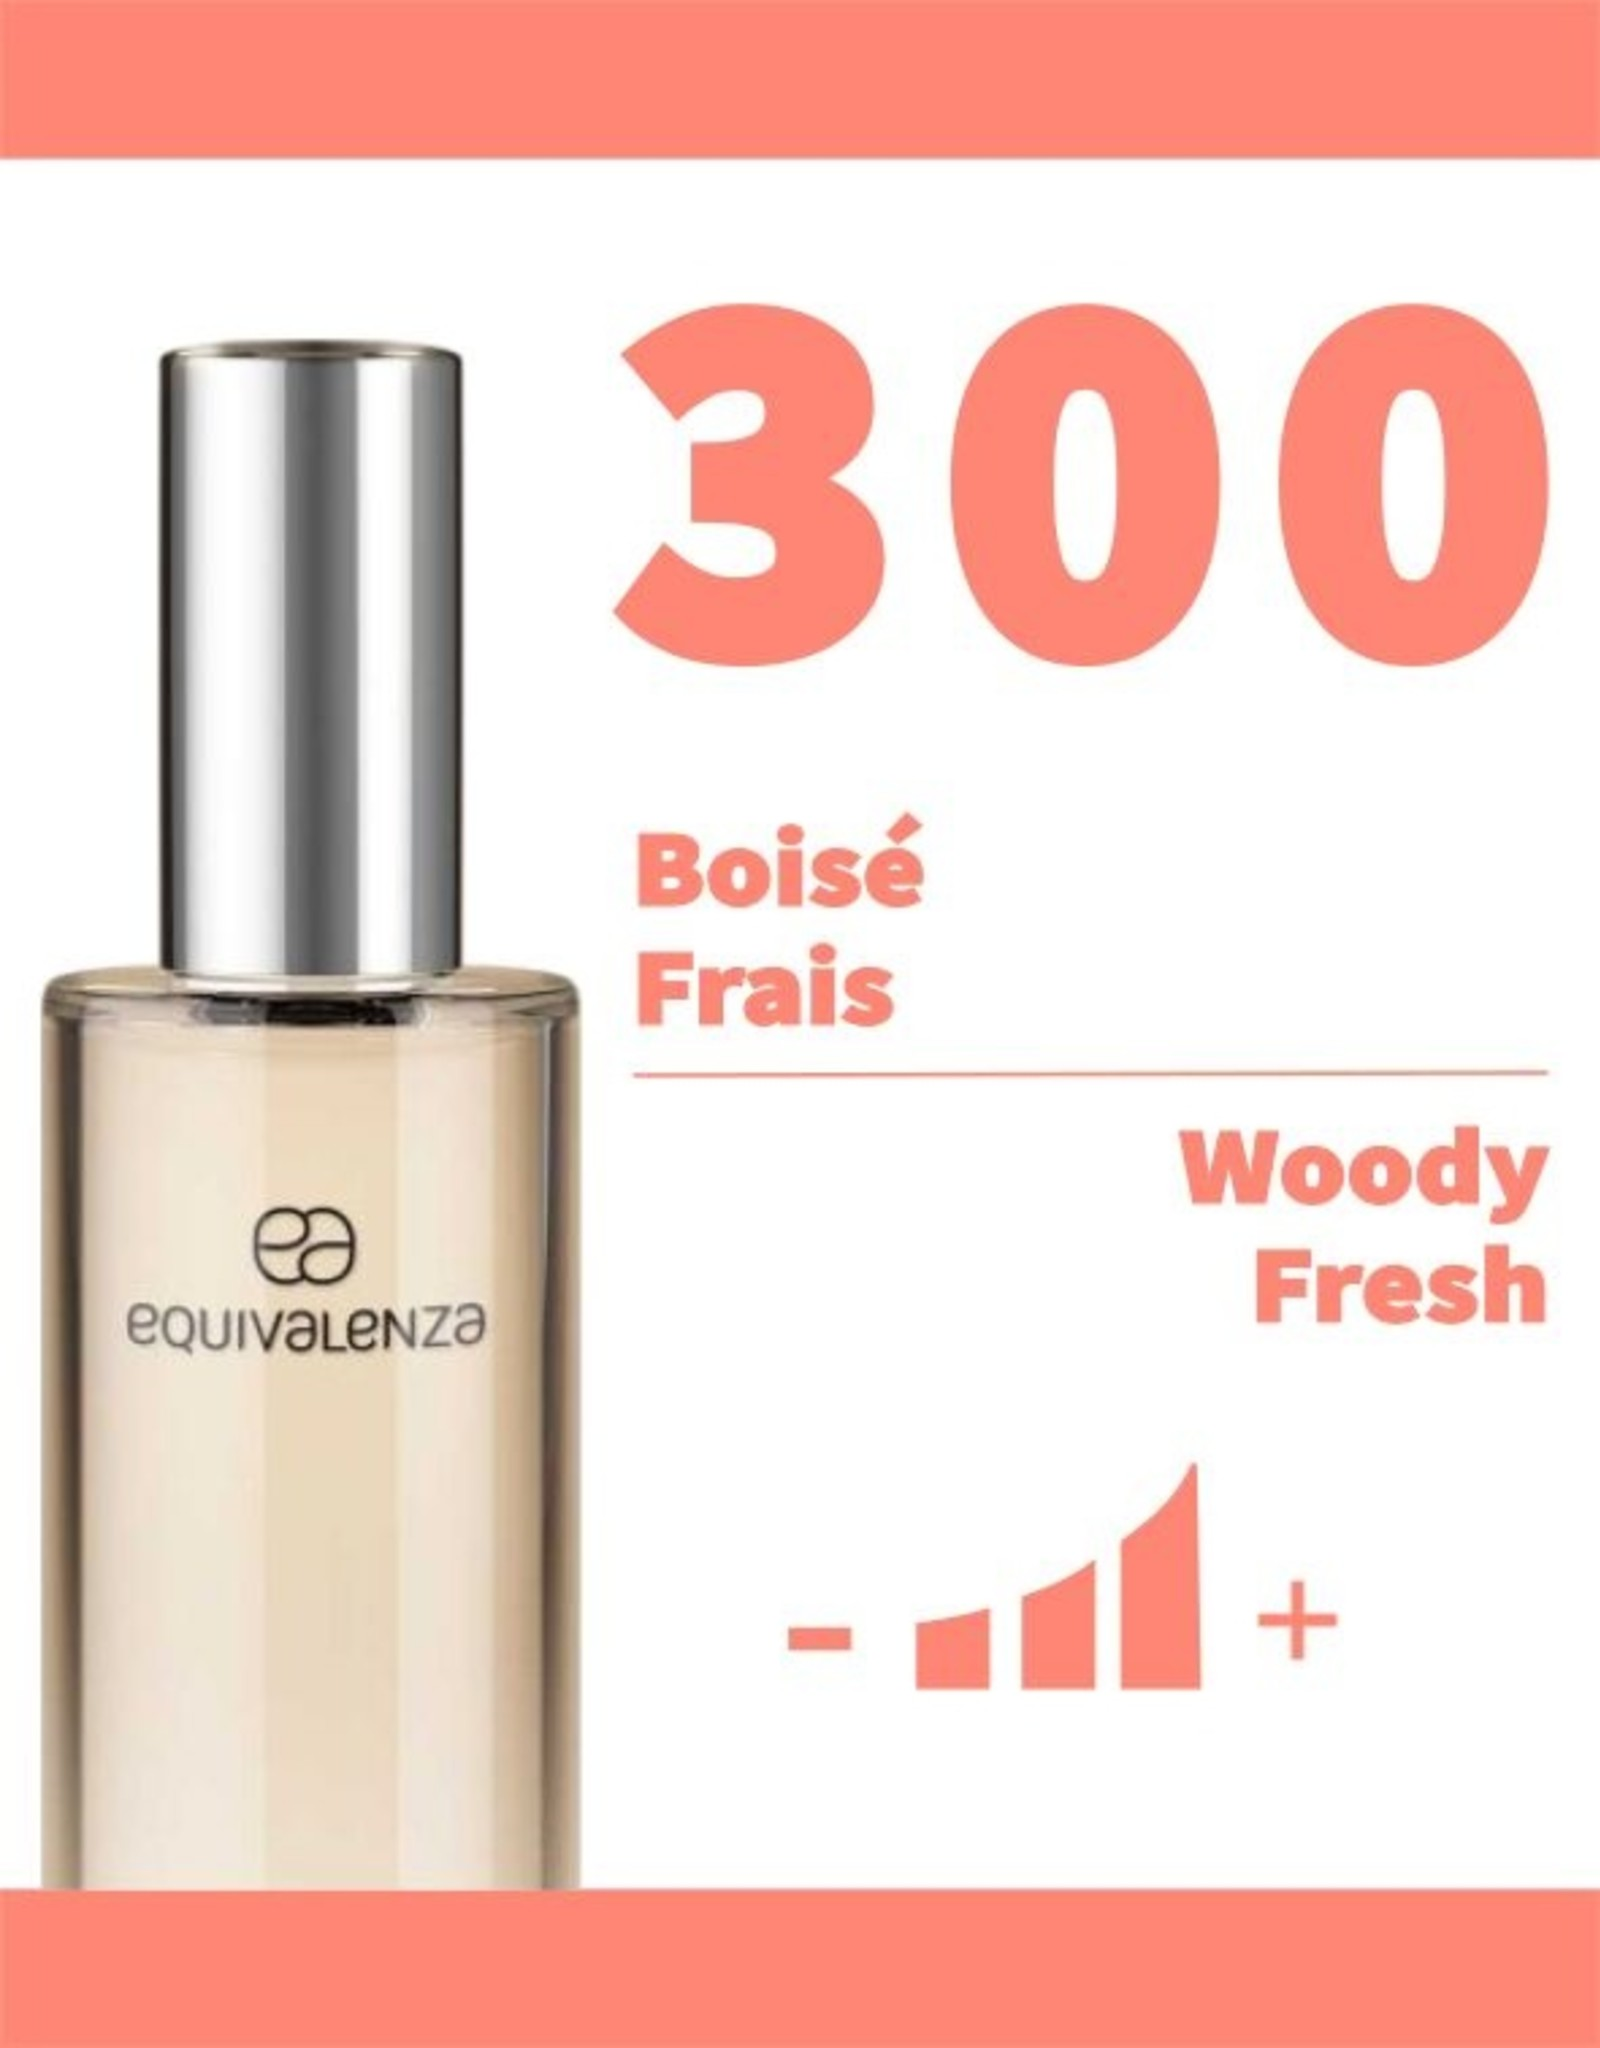 Equivalenza Eau de Parfum Woody Fresh 300